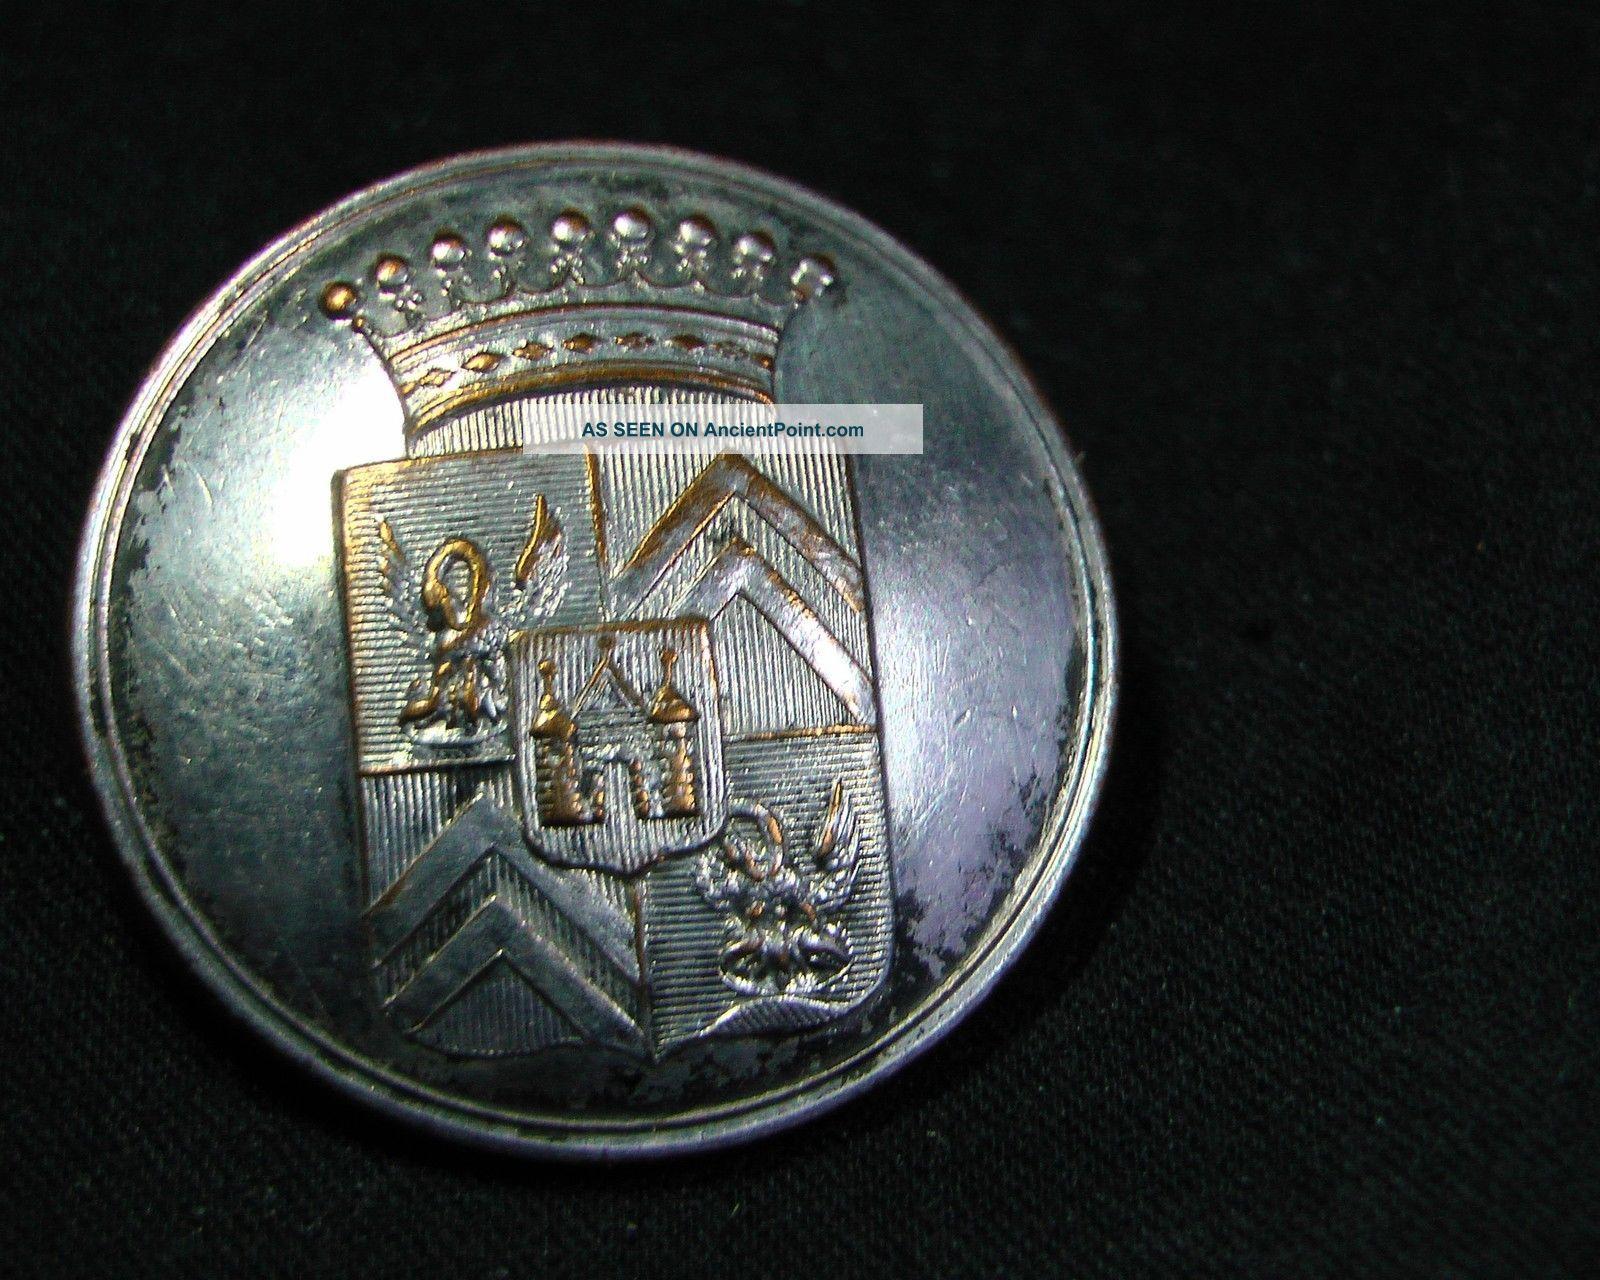 Pourtalès Family Of Cevenol France 25mm Silver Livery Button Treble Plated Buttons photo